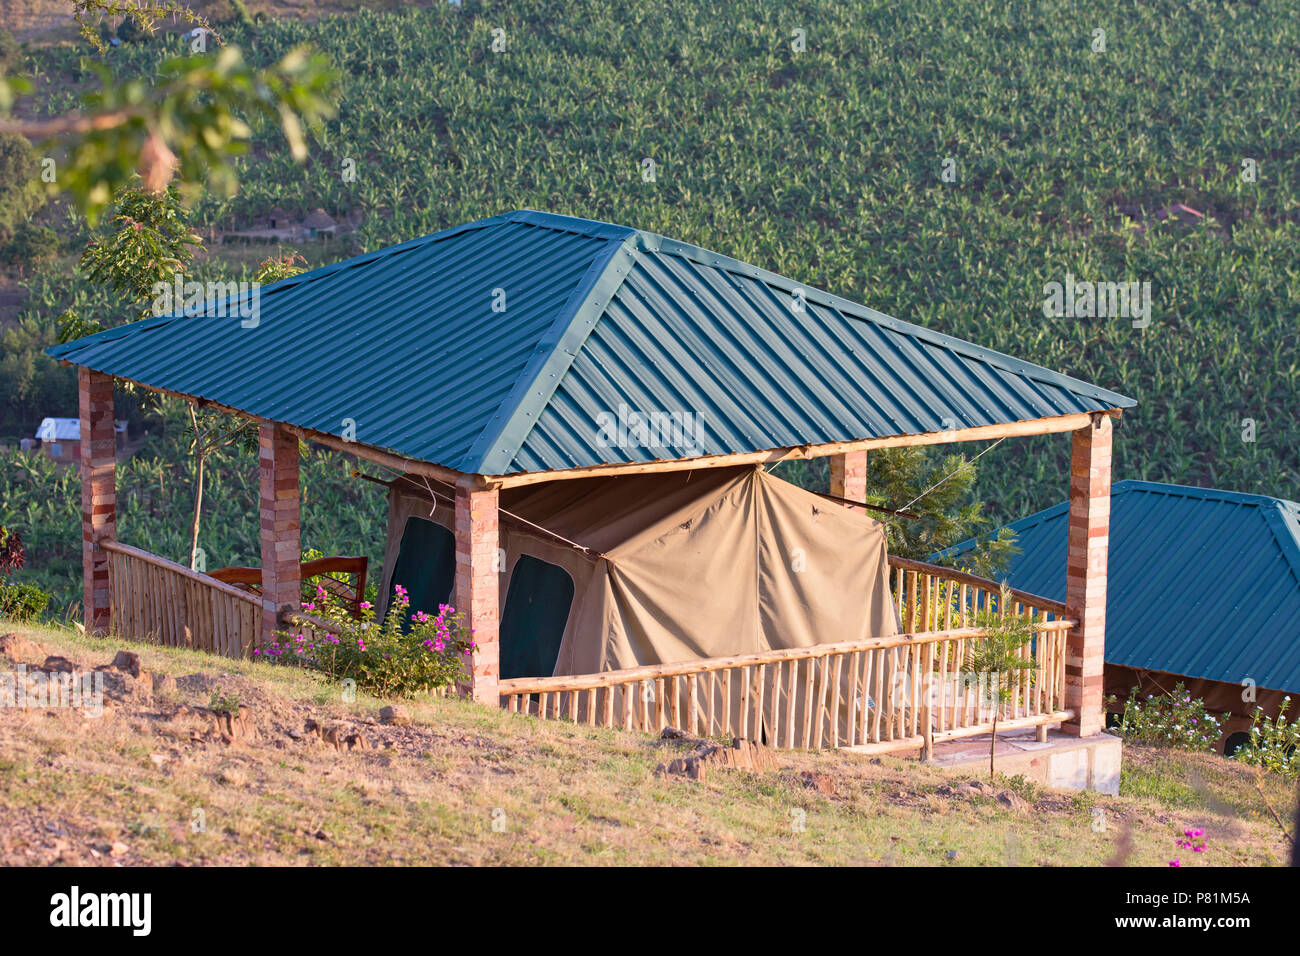 Eagle's Nest, Tented Camp at Lake Mburo, Safari Lodge, Resort, Uganda, East Africa - Stock Image